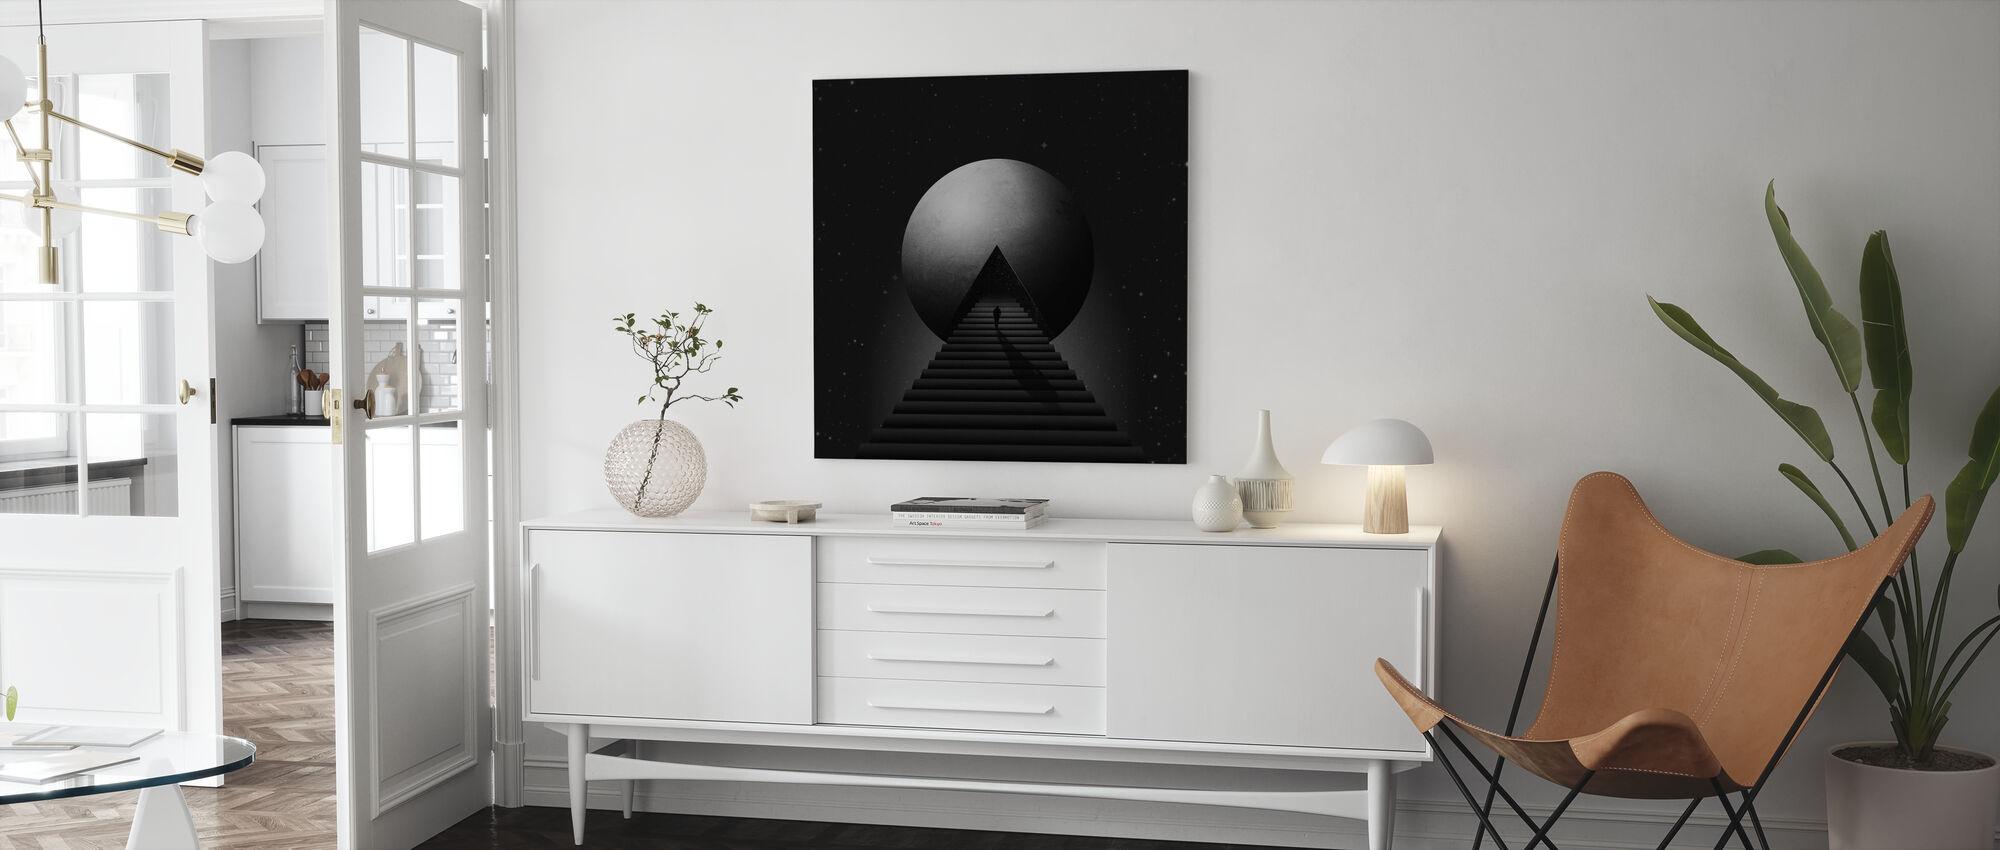 Farewell - Canvas print - Living Room